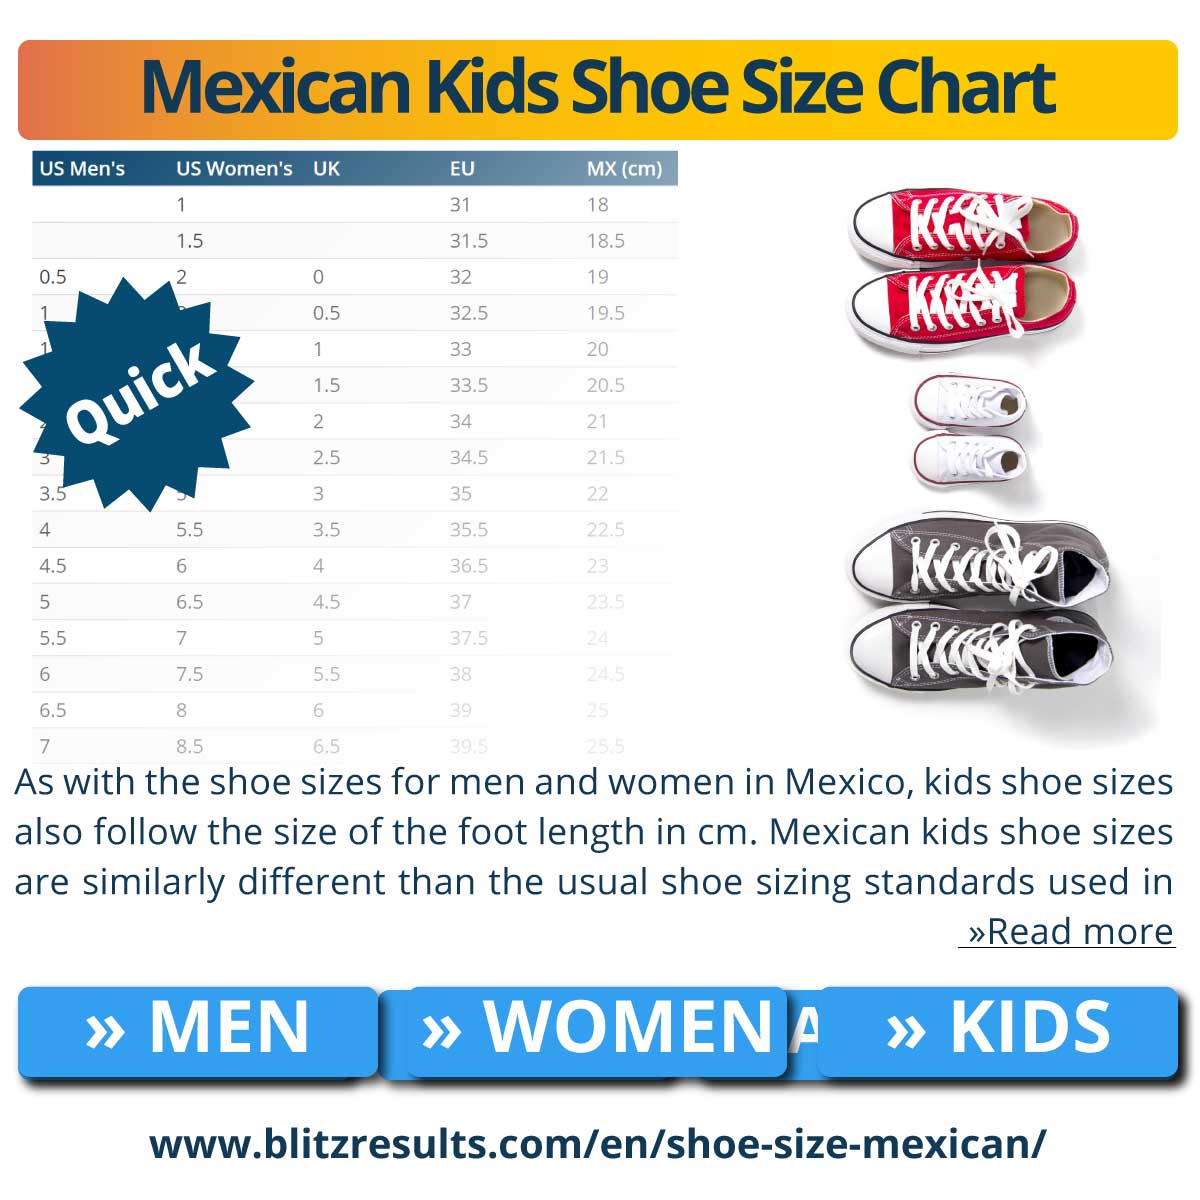 Mexican Kids Shoe Size Chart